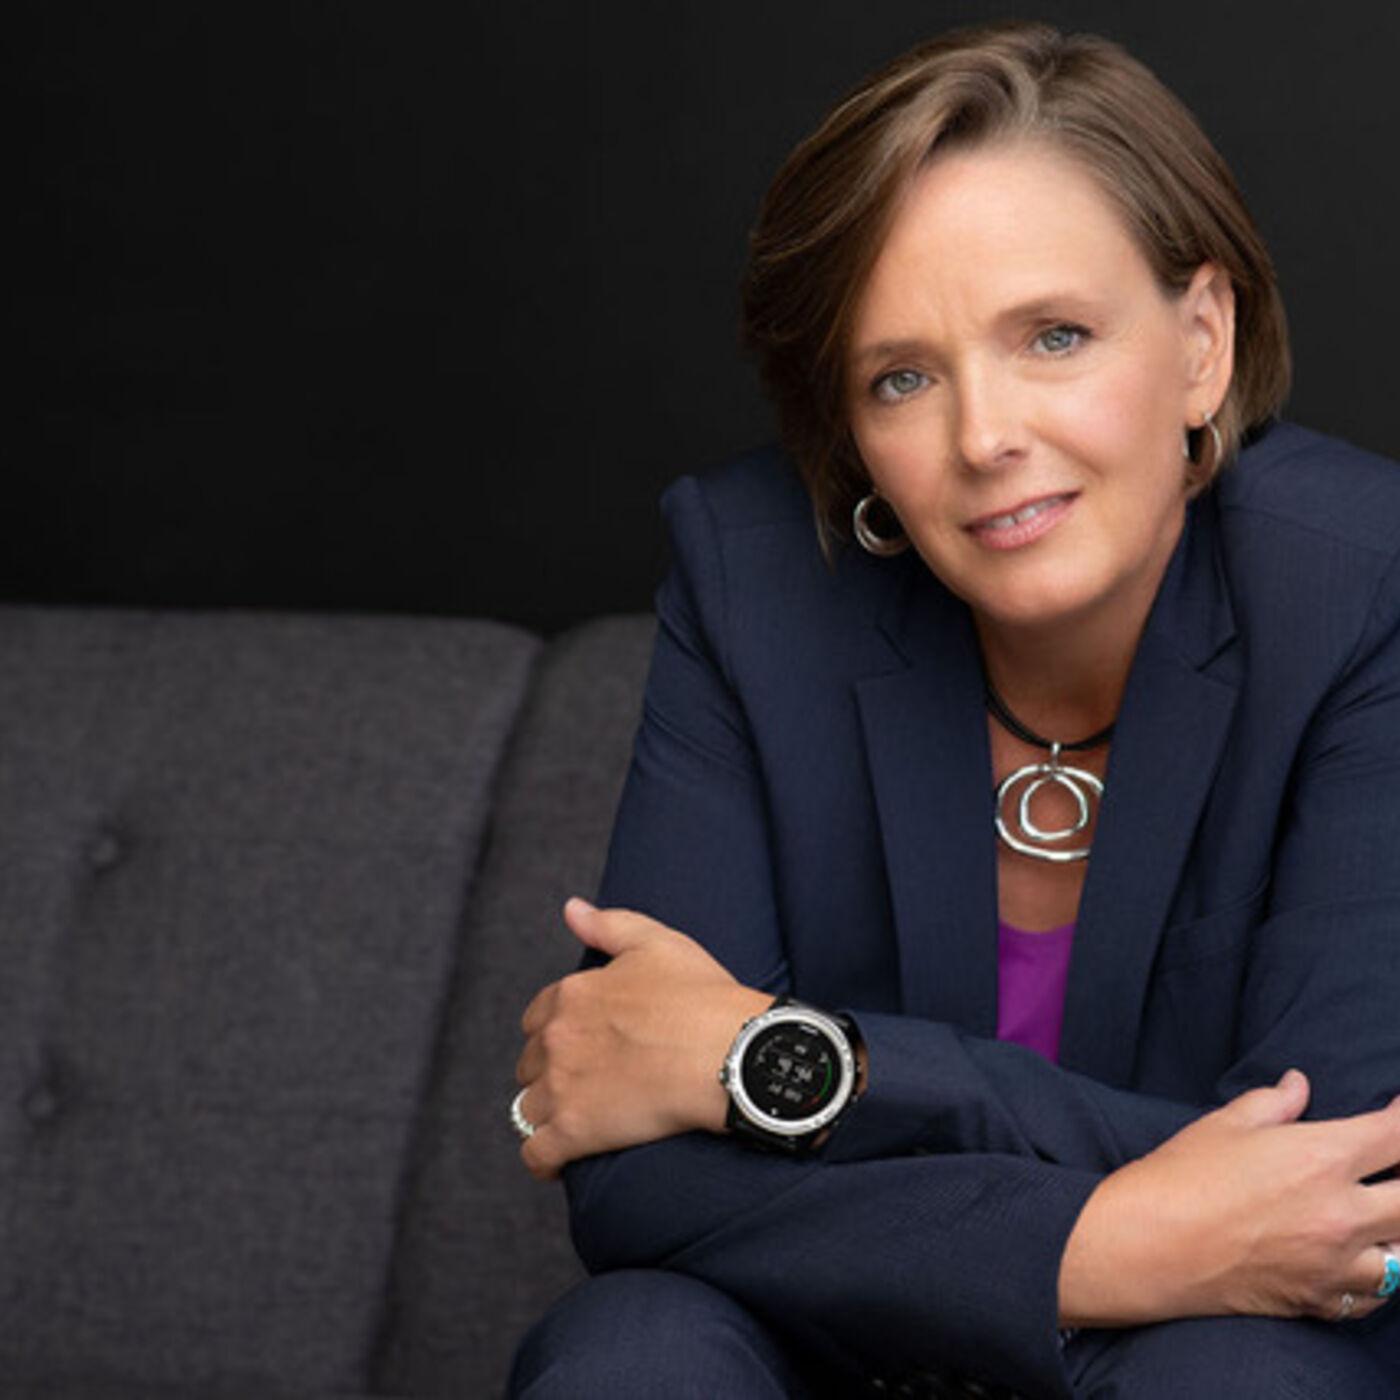 Ellen Fulton - Master Certified Coach, Coach Educator and Creator of Conversations2Mastery (Season 2, Episode #31)